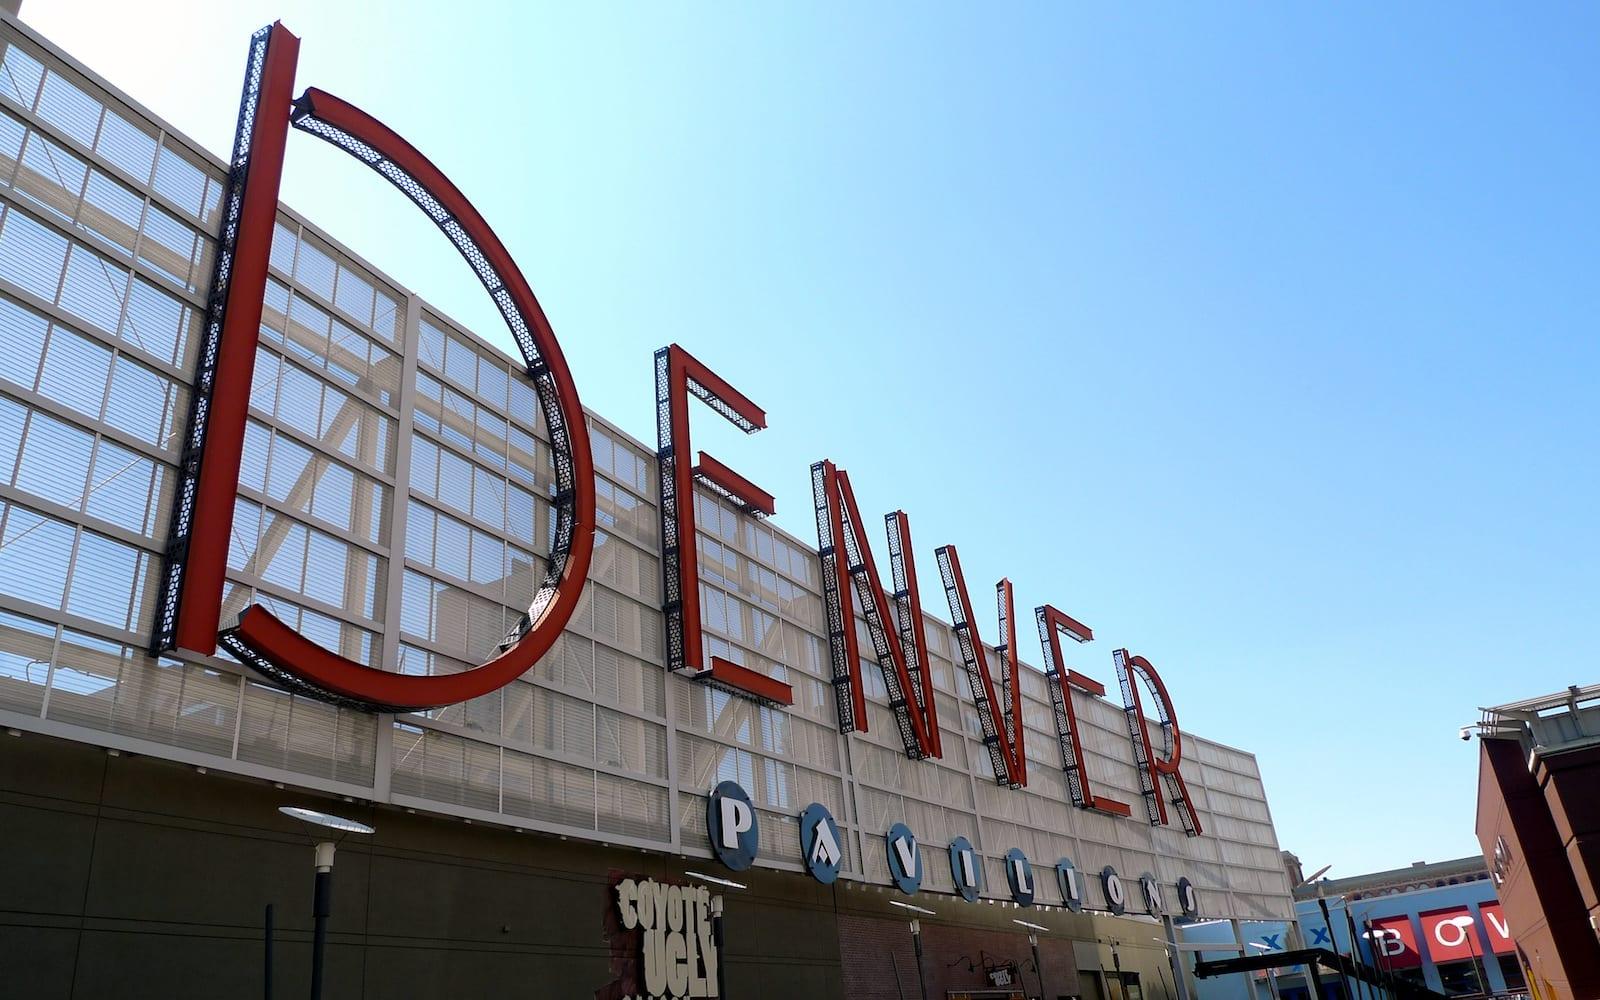 Denver Pavillions, CO